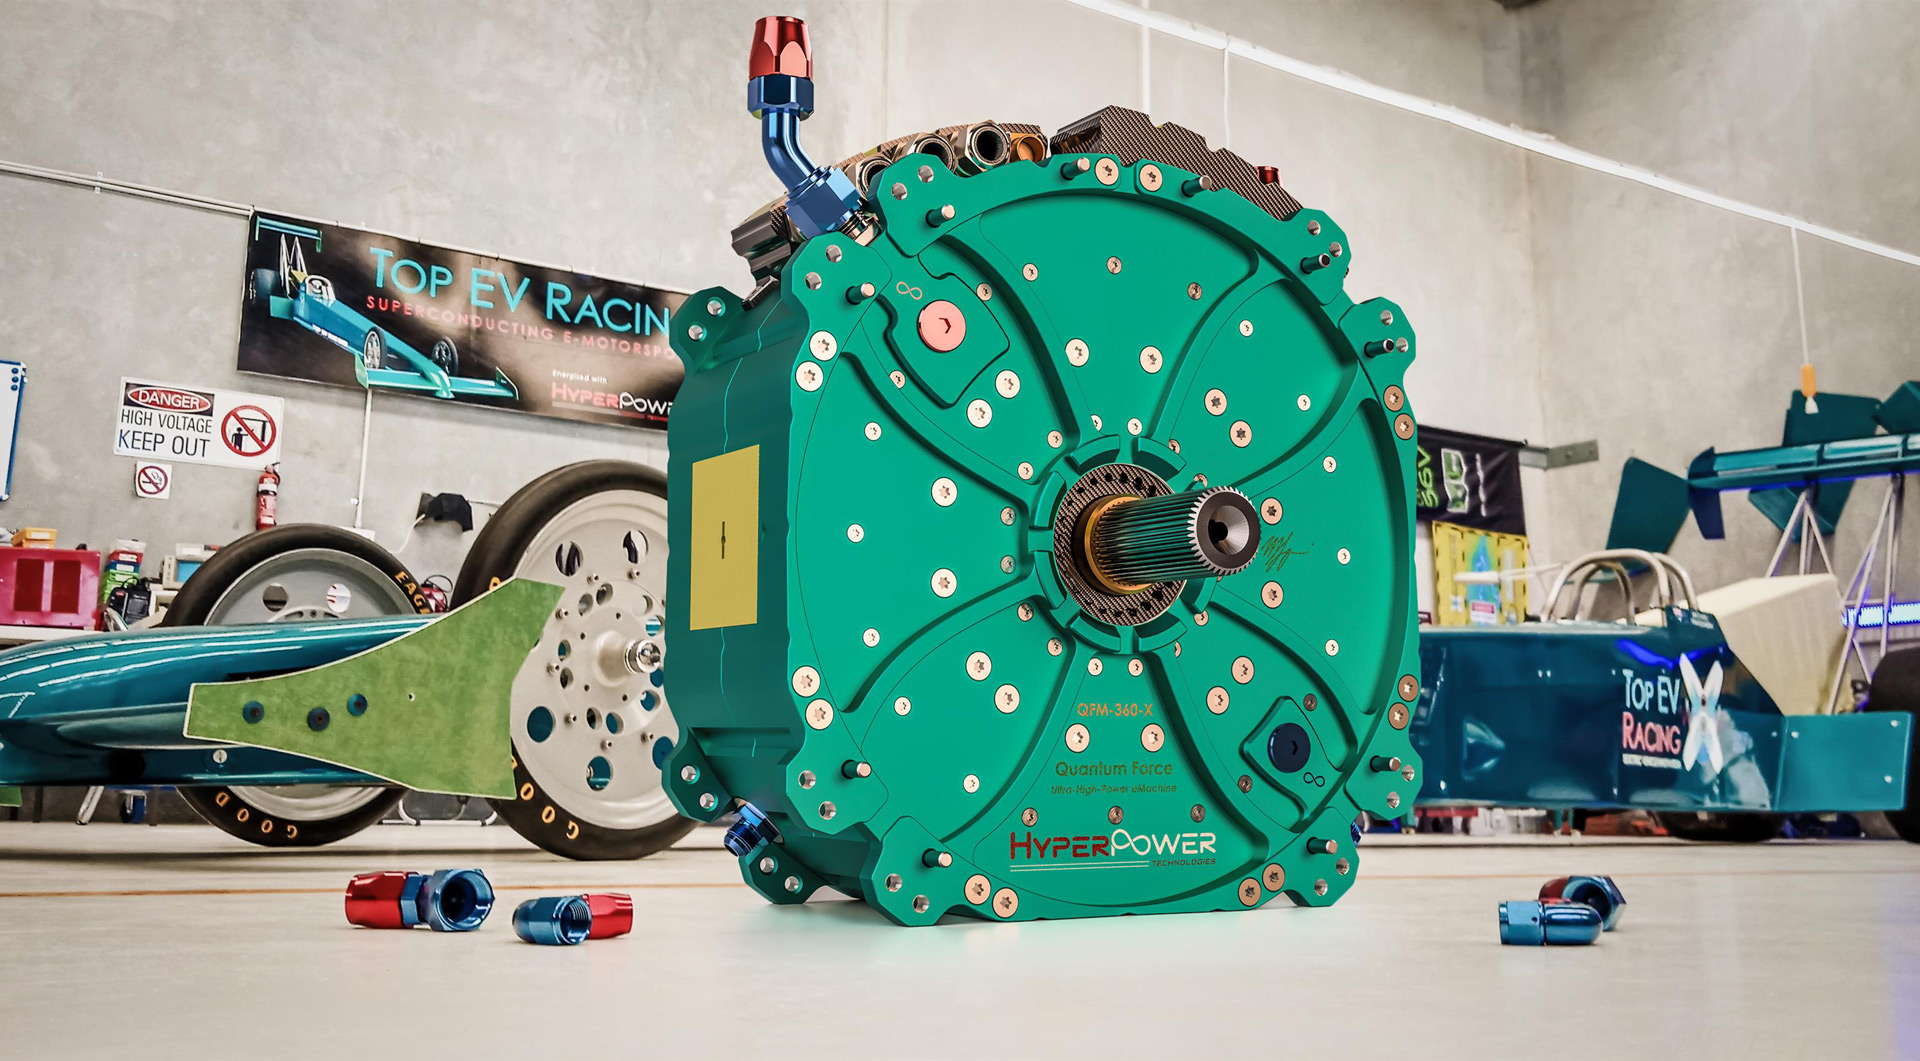 Australian company unveils 1,340-horsepower electric motor for hypercar, hyperloop applications